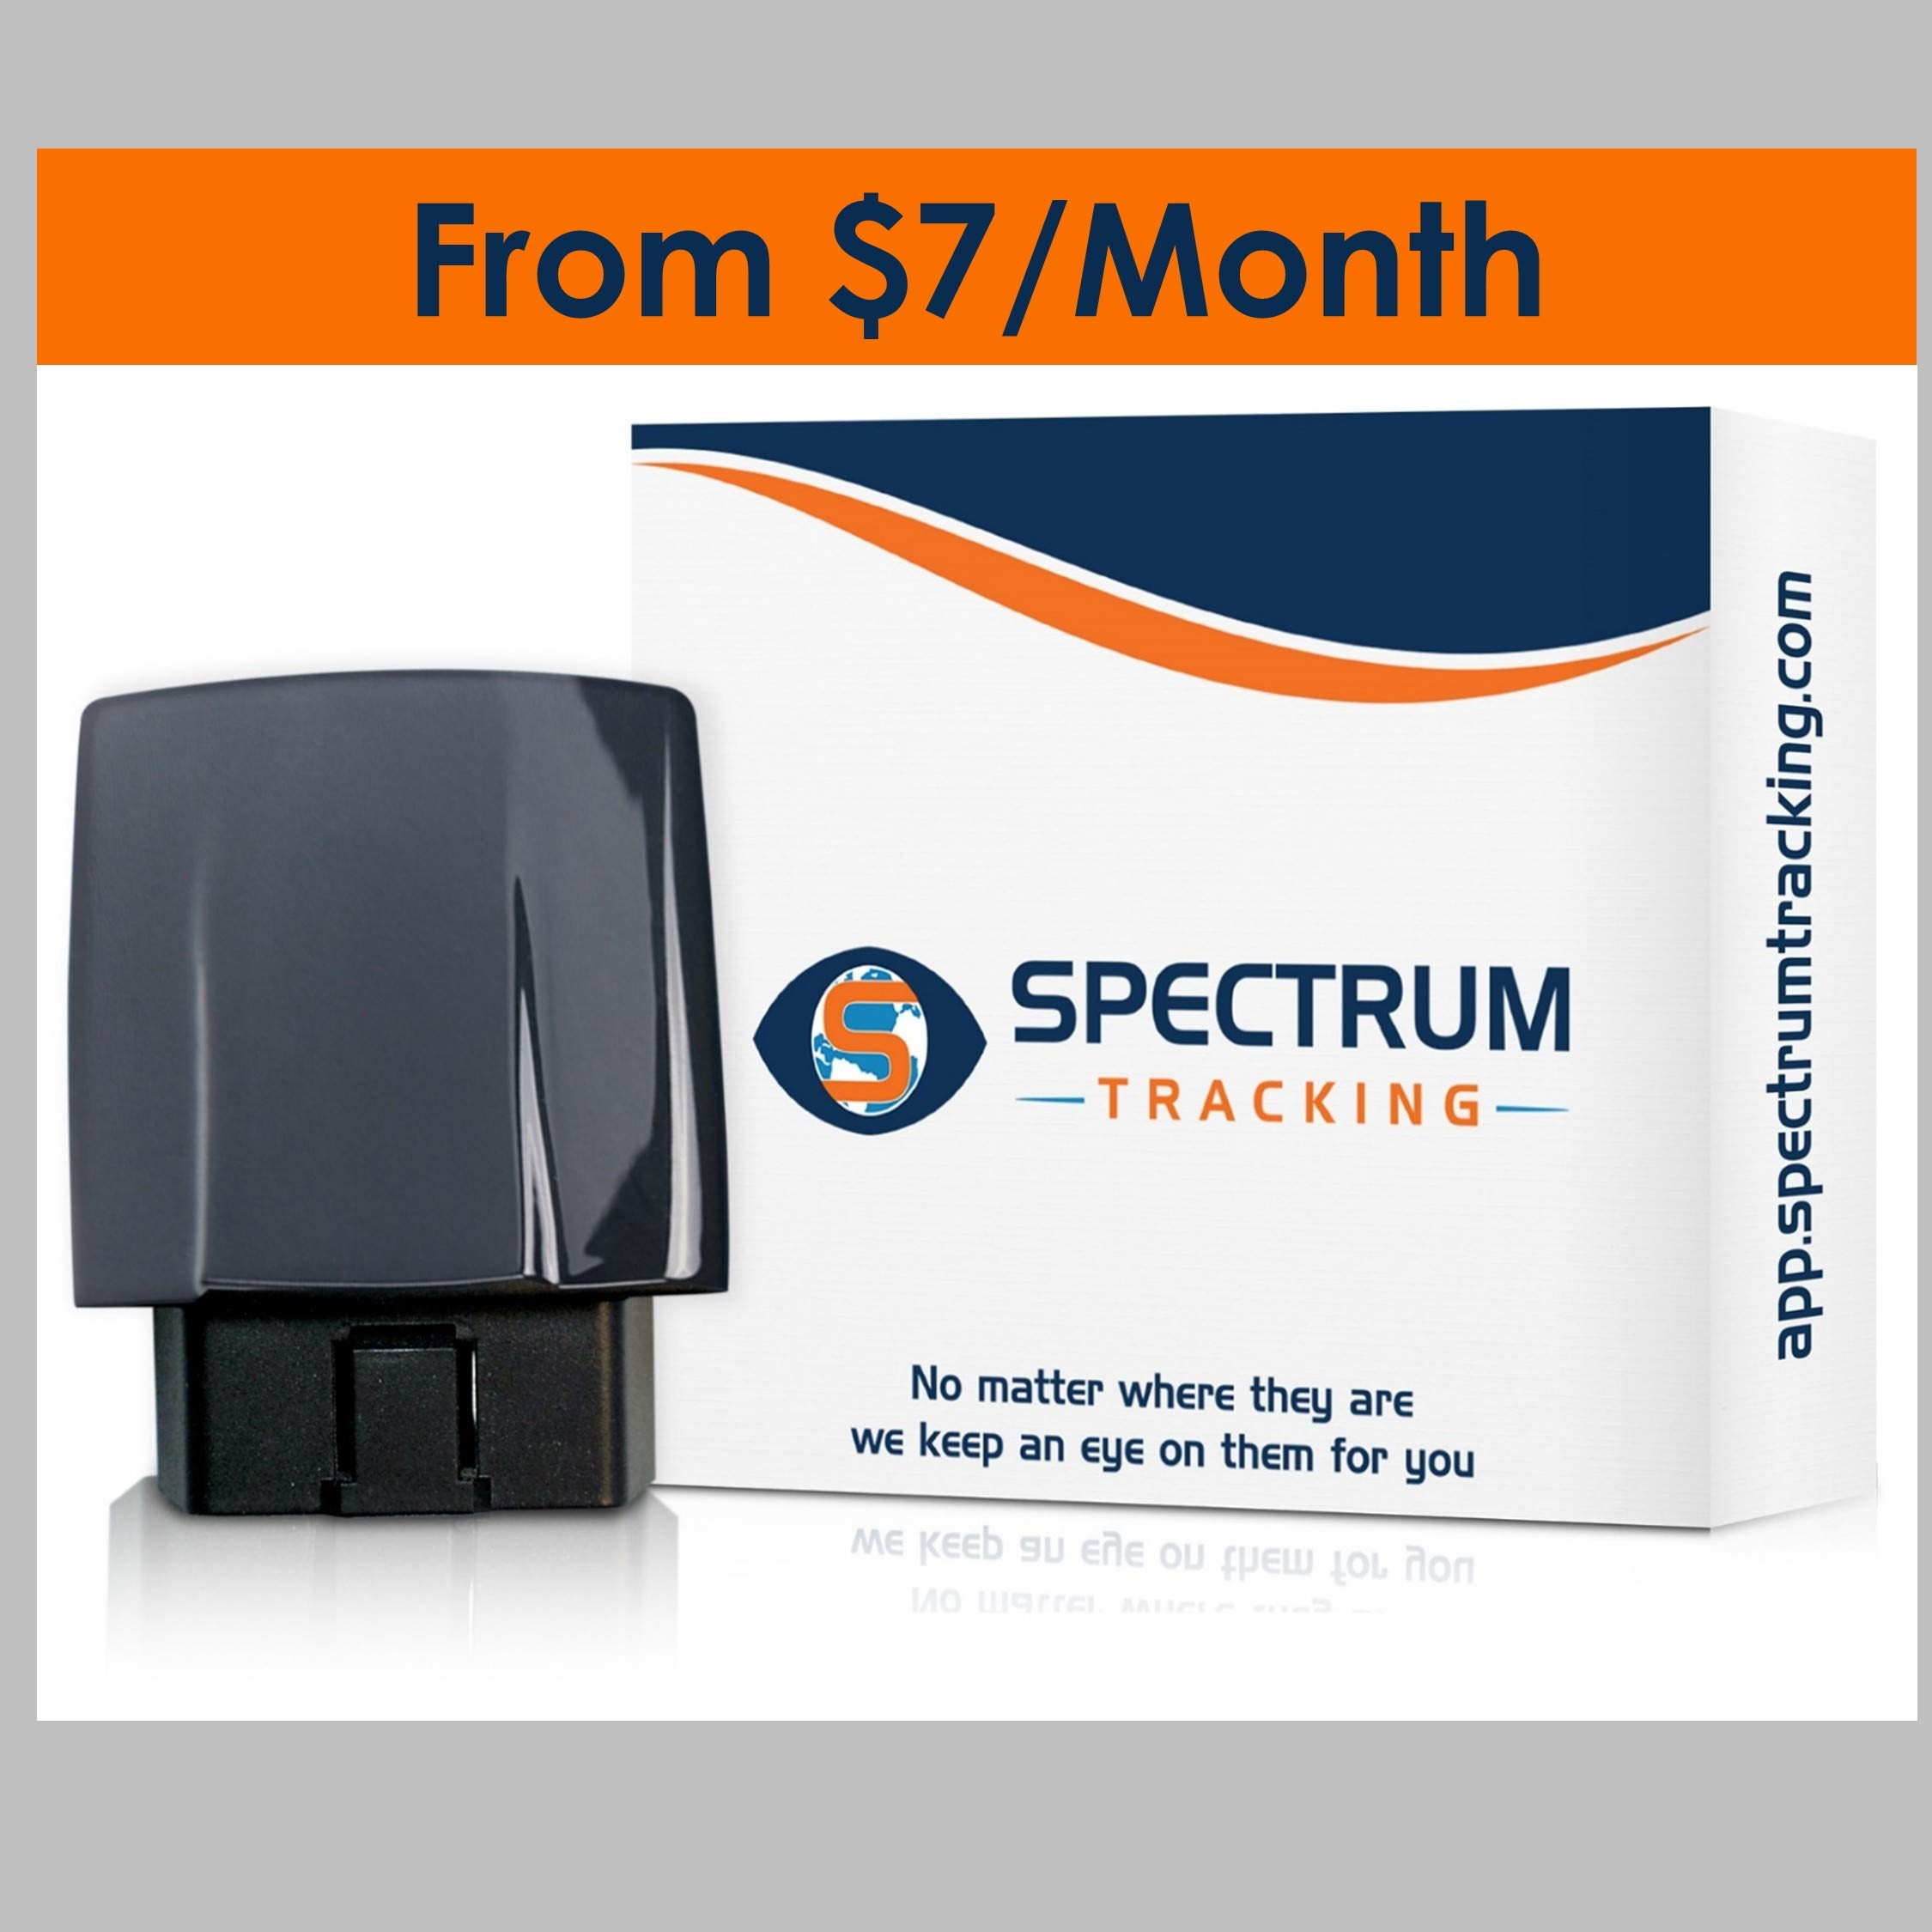 Spectrum Smart: OBD GPS Tracker - Track Location | Speed | Fuel | Teen Unsafe Driving - Engine Diagnostics - Alerts, Geo Fences - Teenager, Family, Fleet Tracking